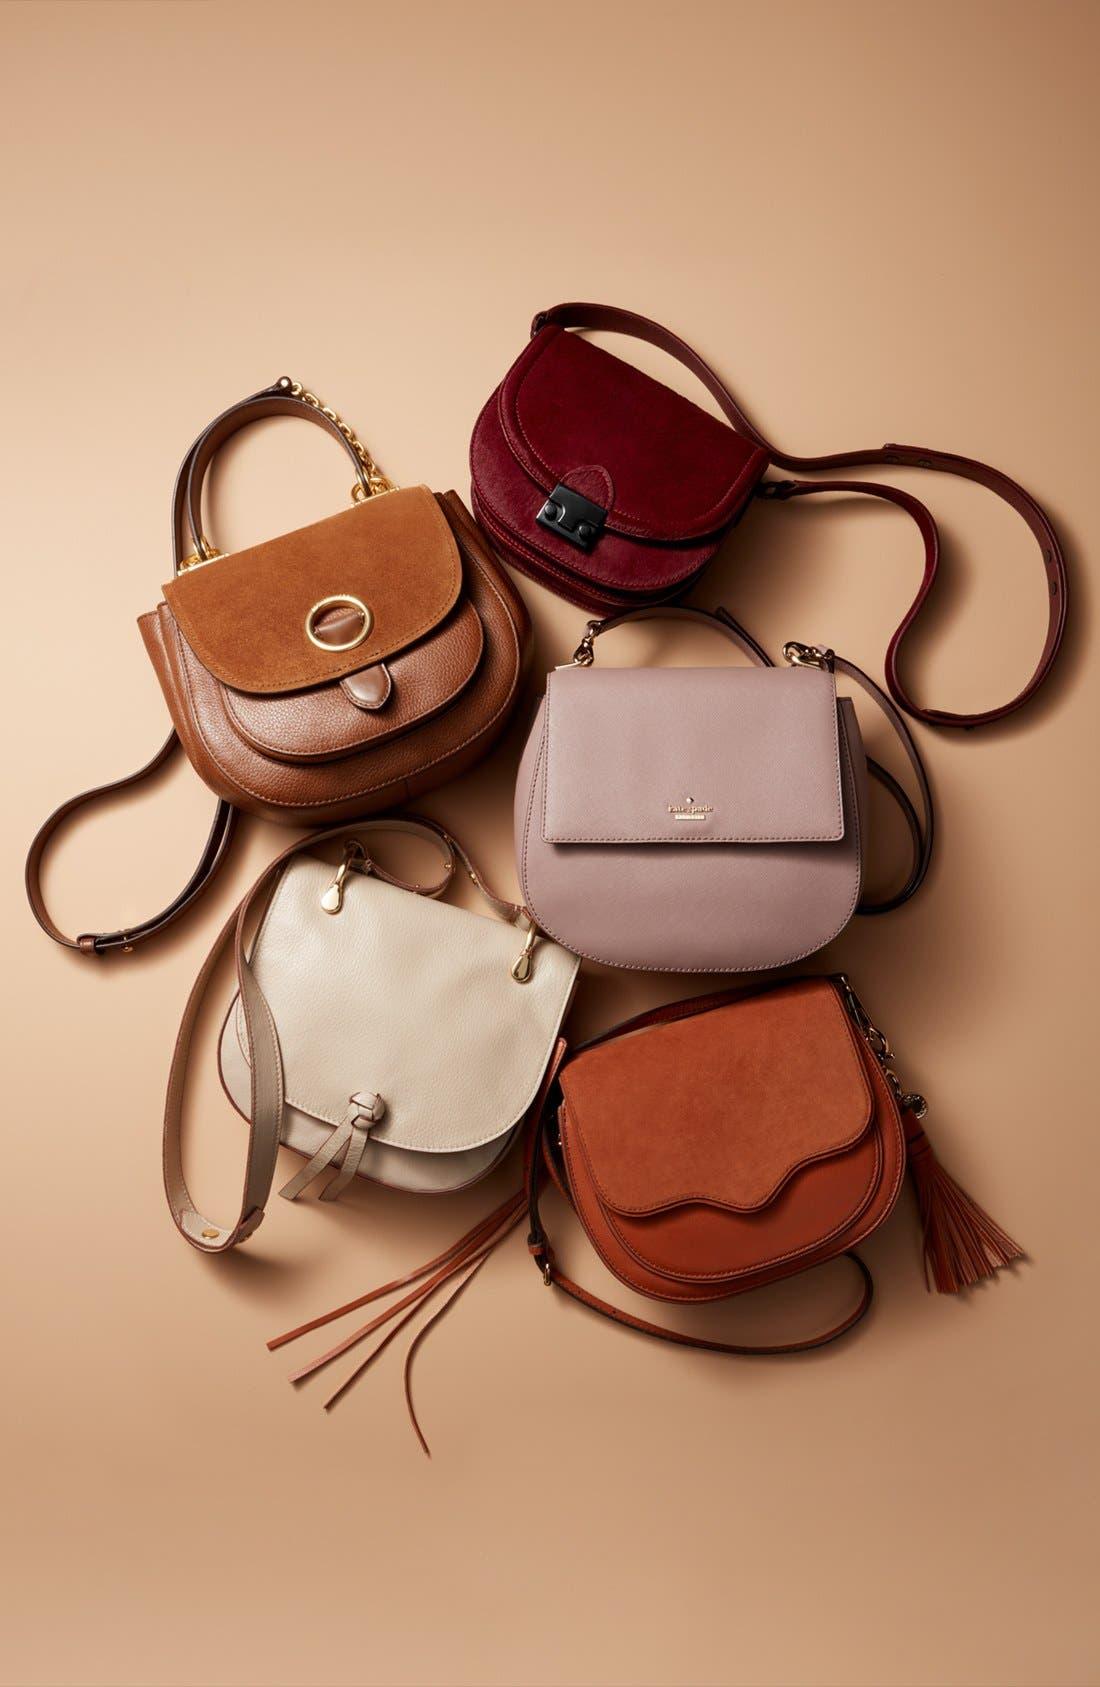 cameron street - byrdie leather crossbody bag,                             Alternate thumbnail 9, color,                             301